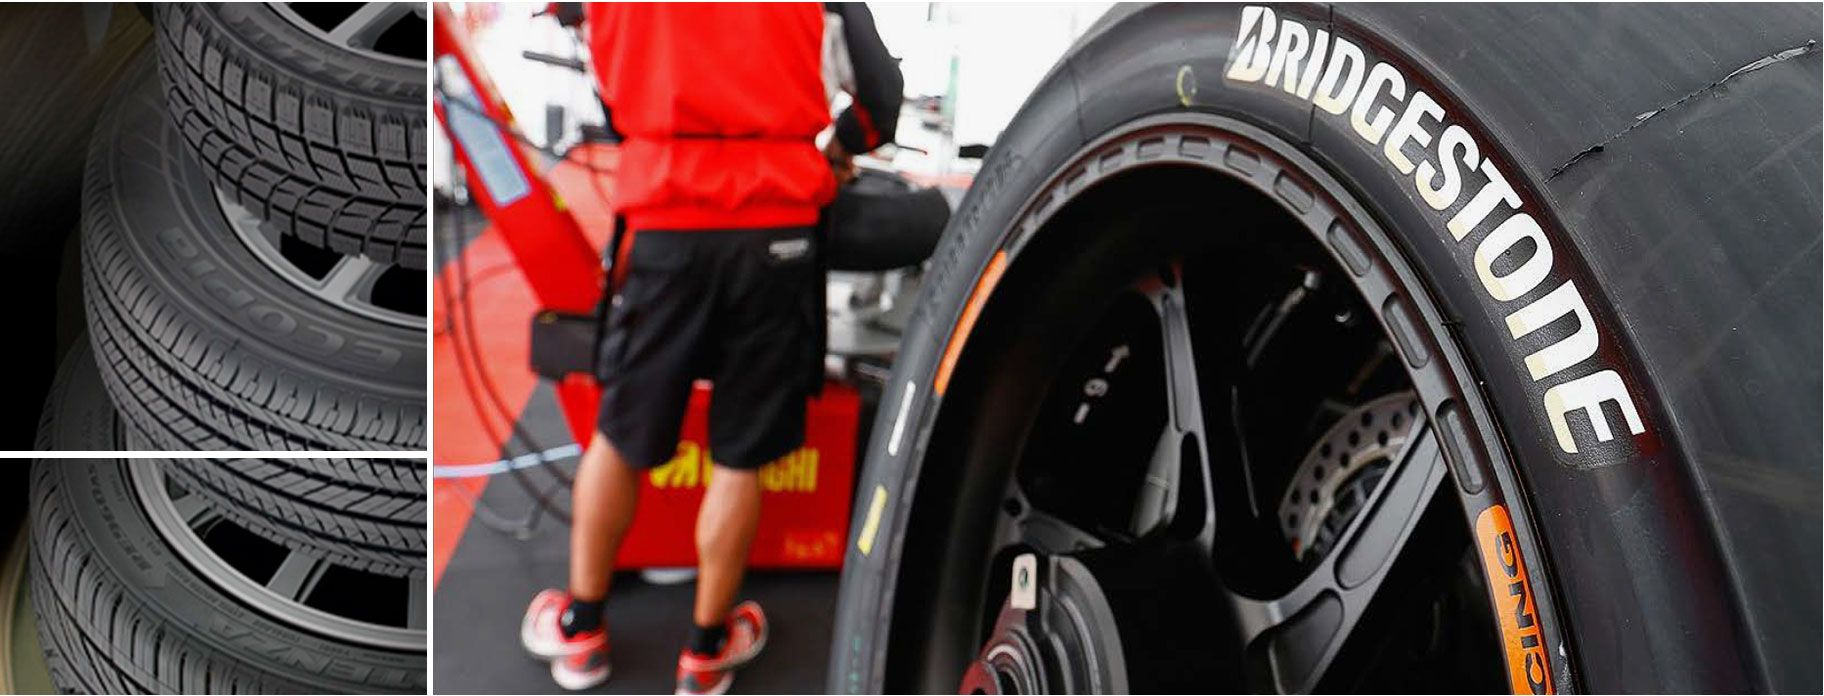 Bridgestone Tyres UAE